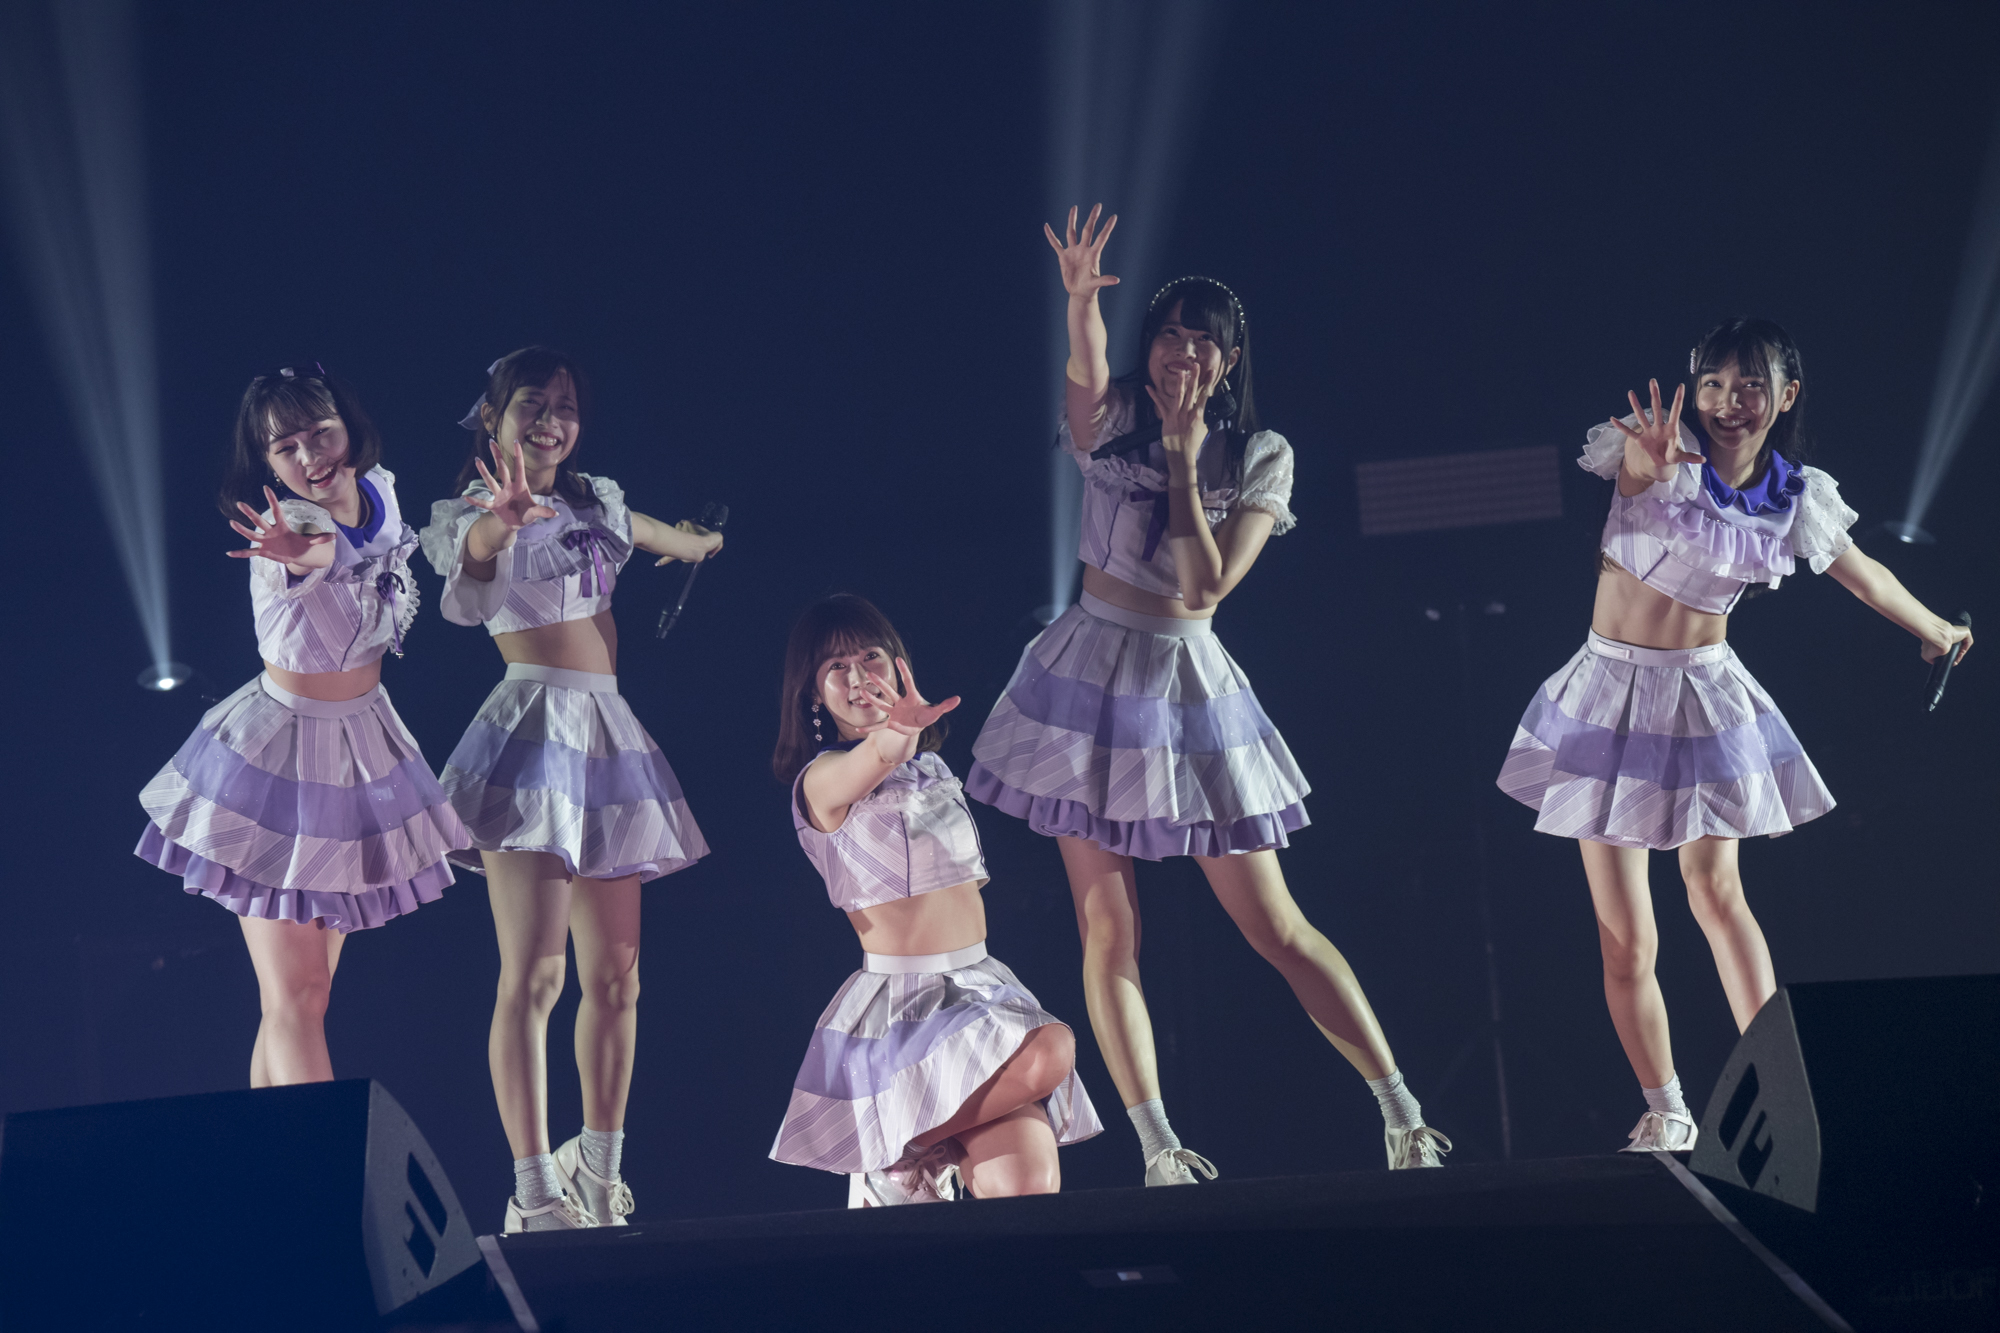 Ange☆Reve(左から 原姫子・佐々木璃花・権田夏海・水野結愛・吉橋亜理砂)